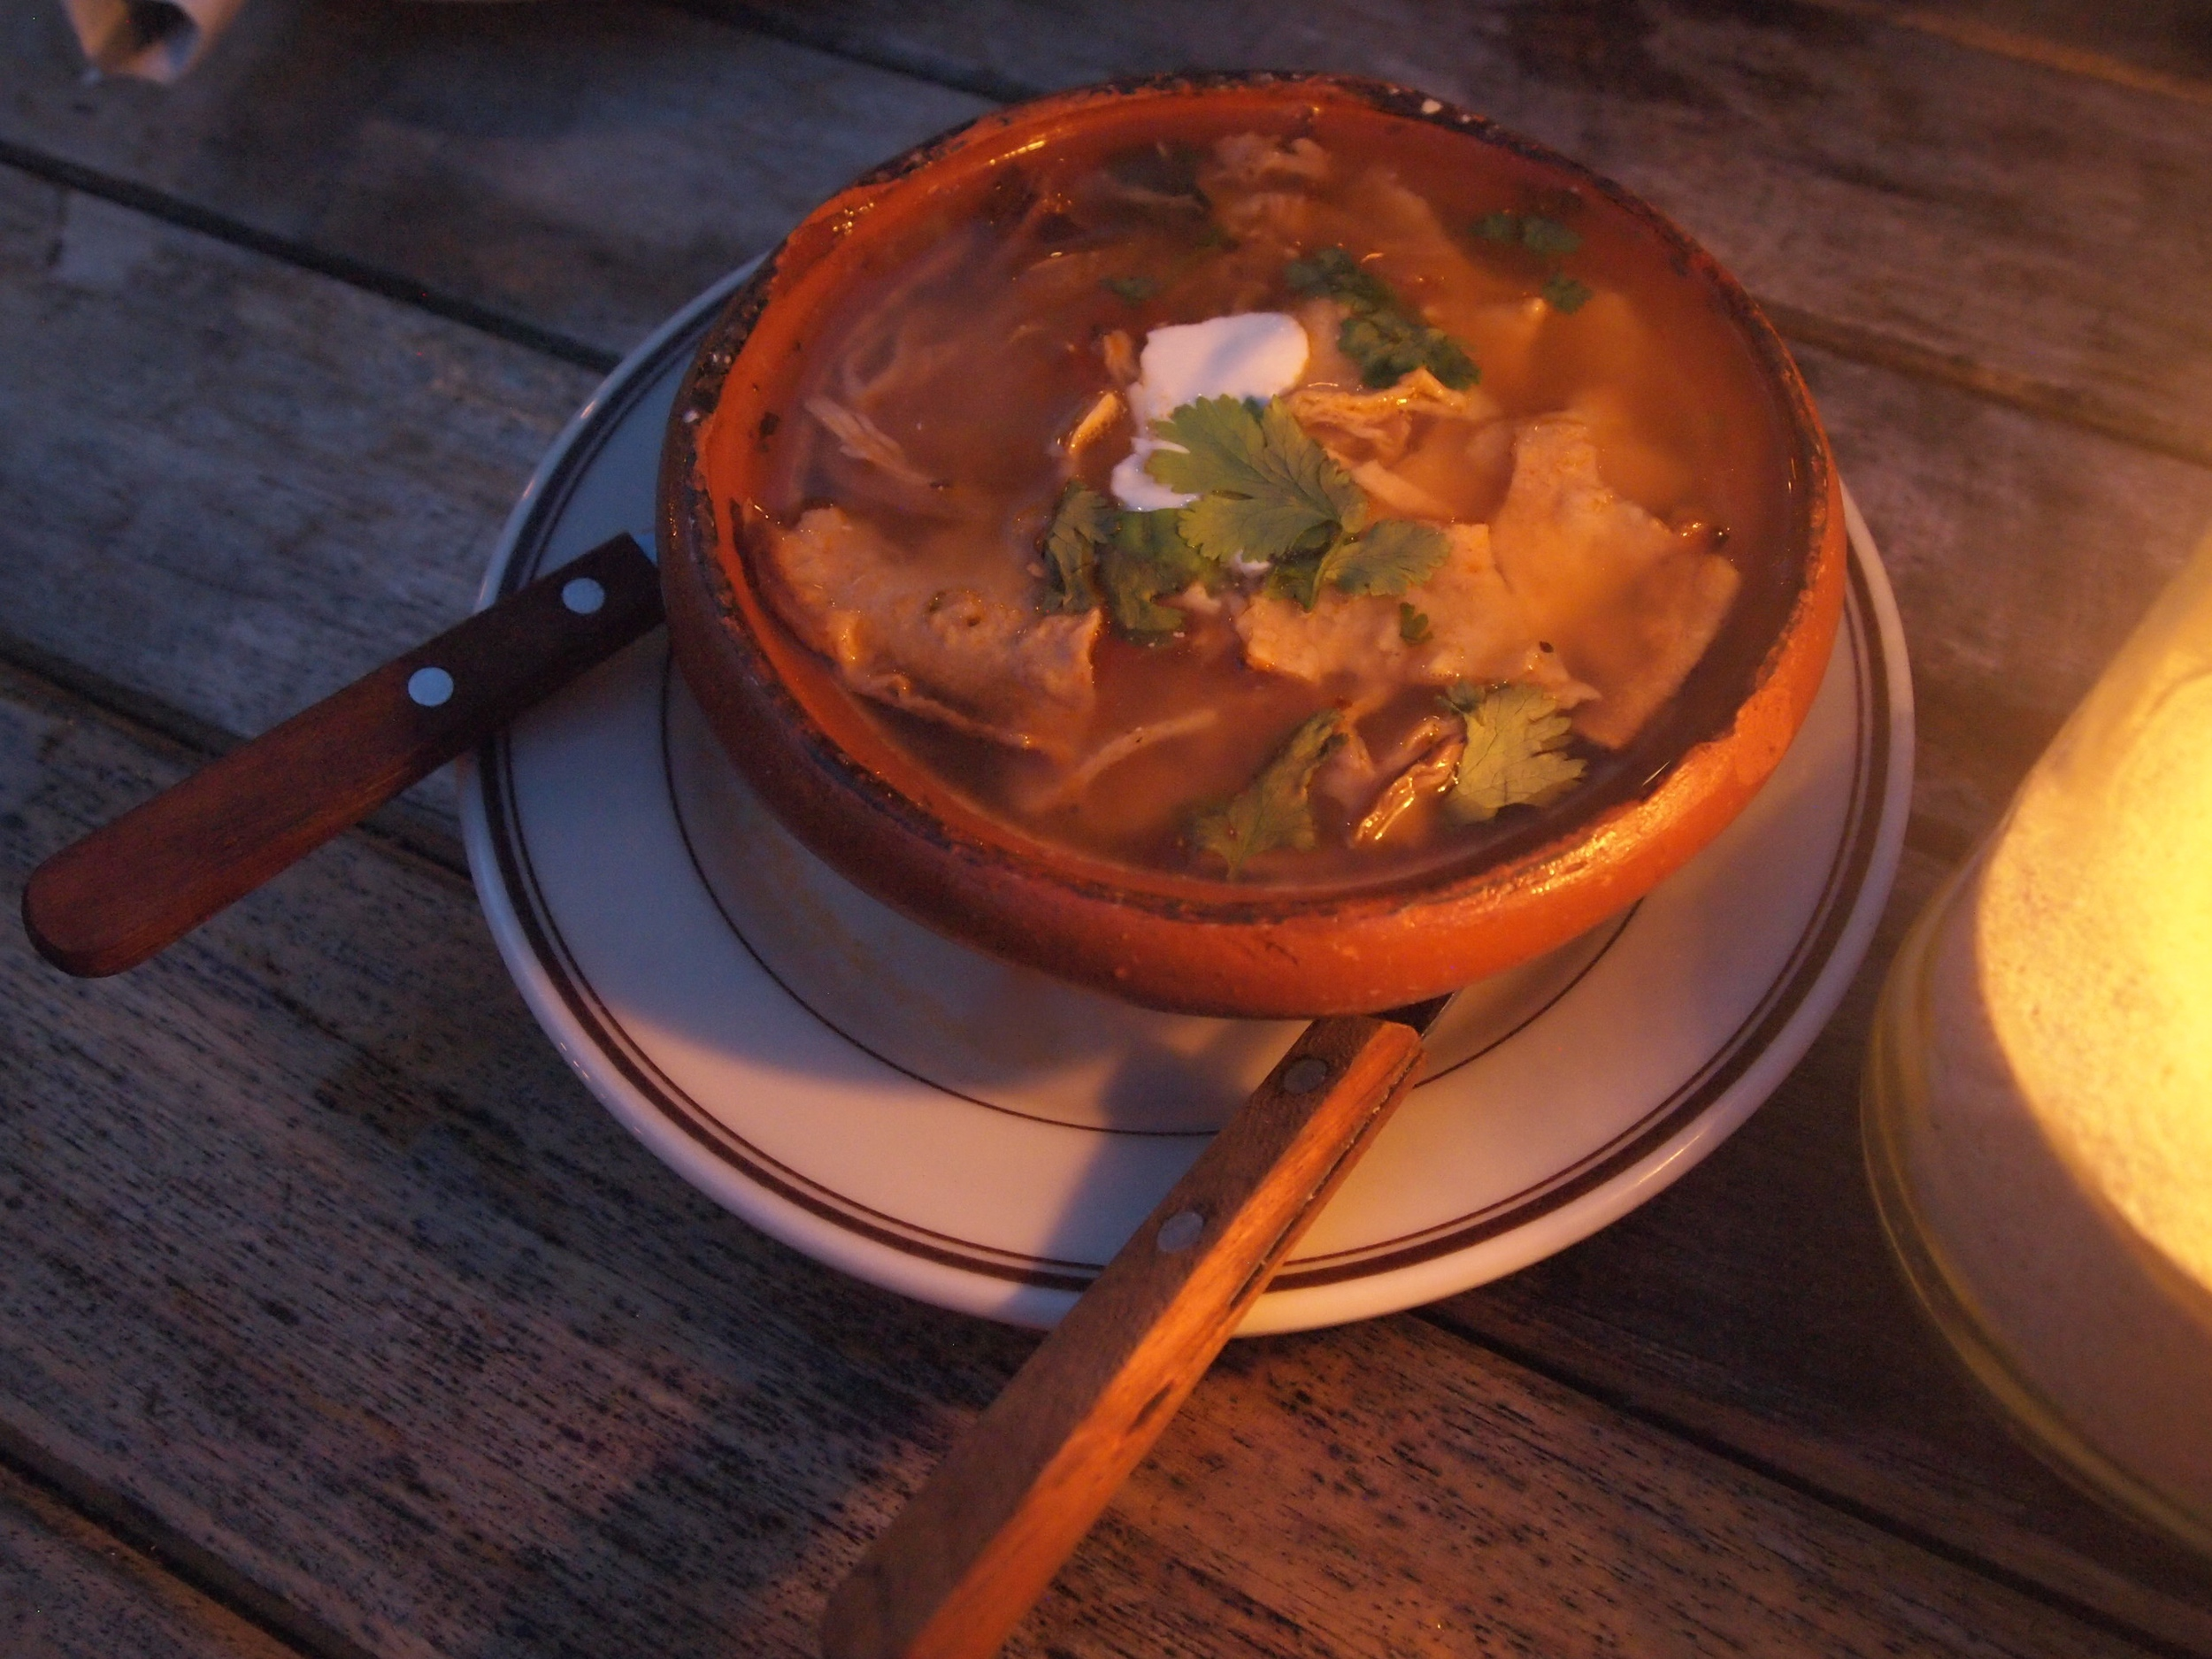 The food: Tortilla soup